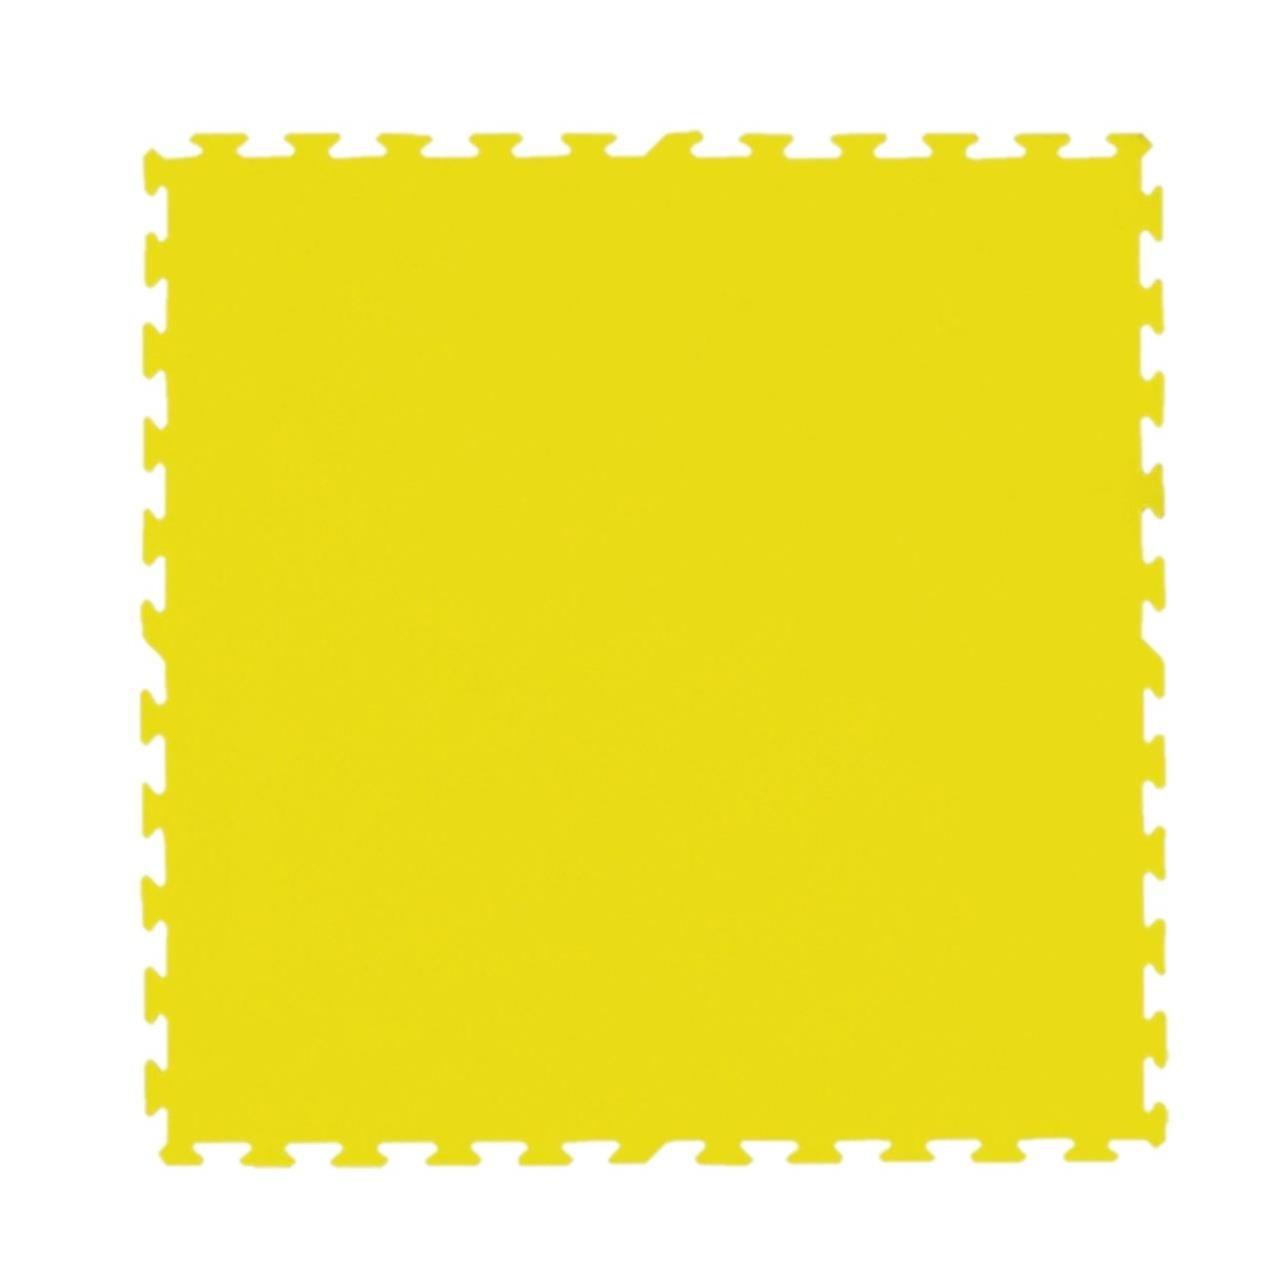 Tatame de Borracha EVA 100x100 cm Amarelo - Ibel